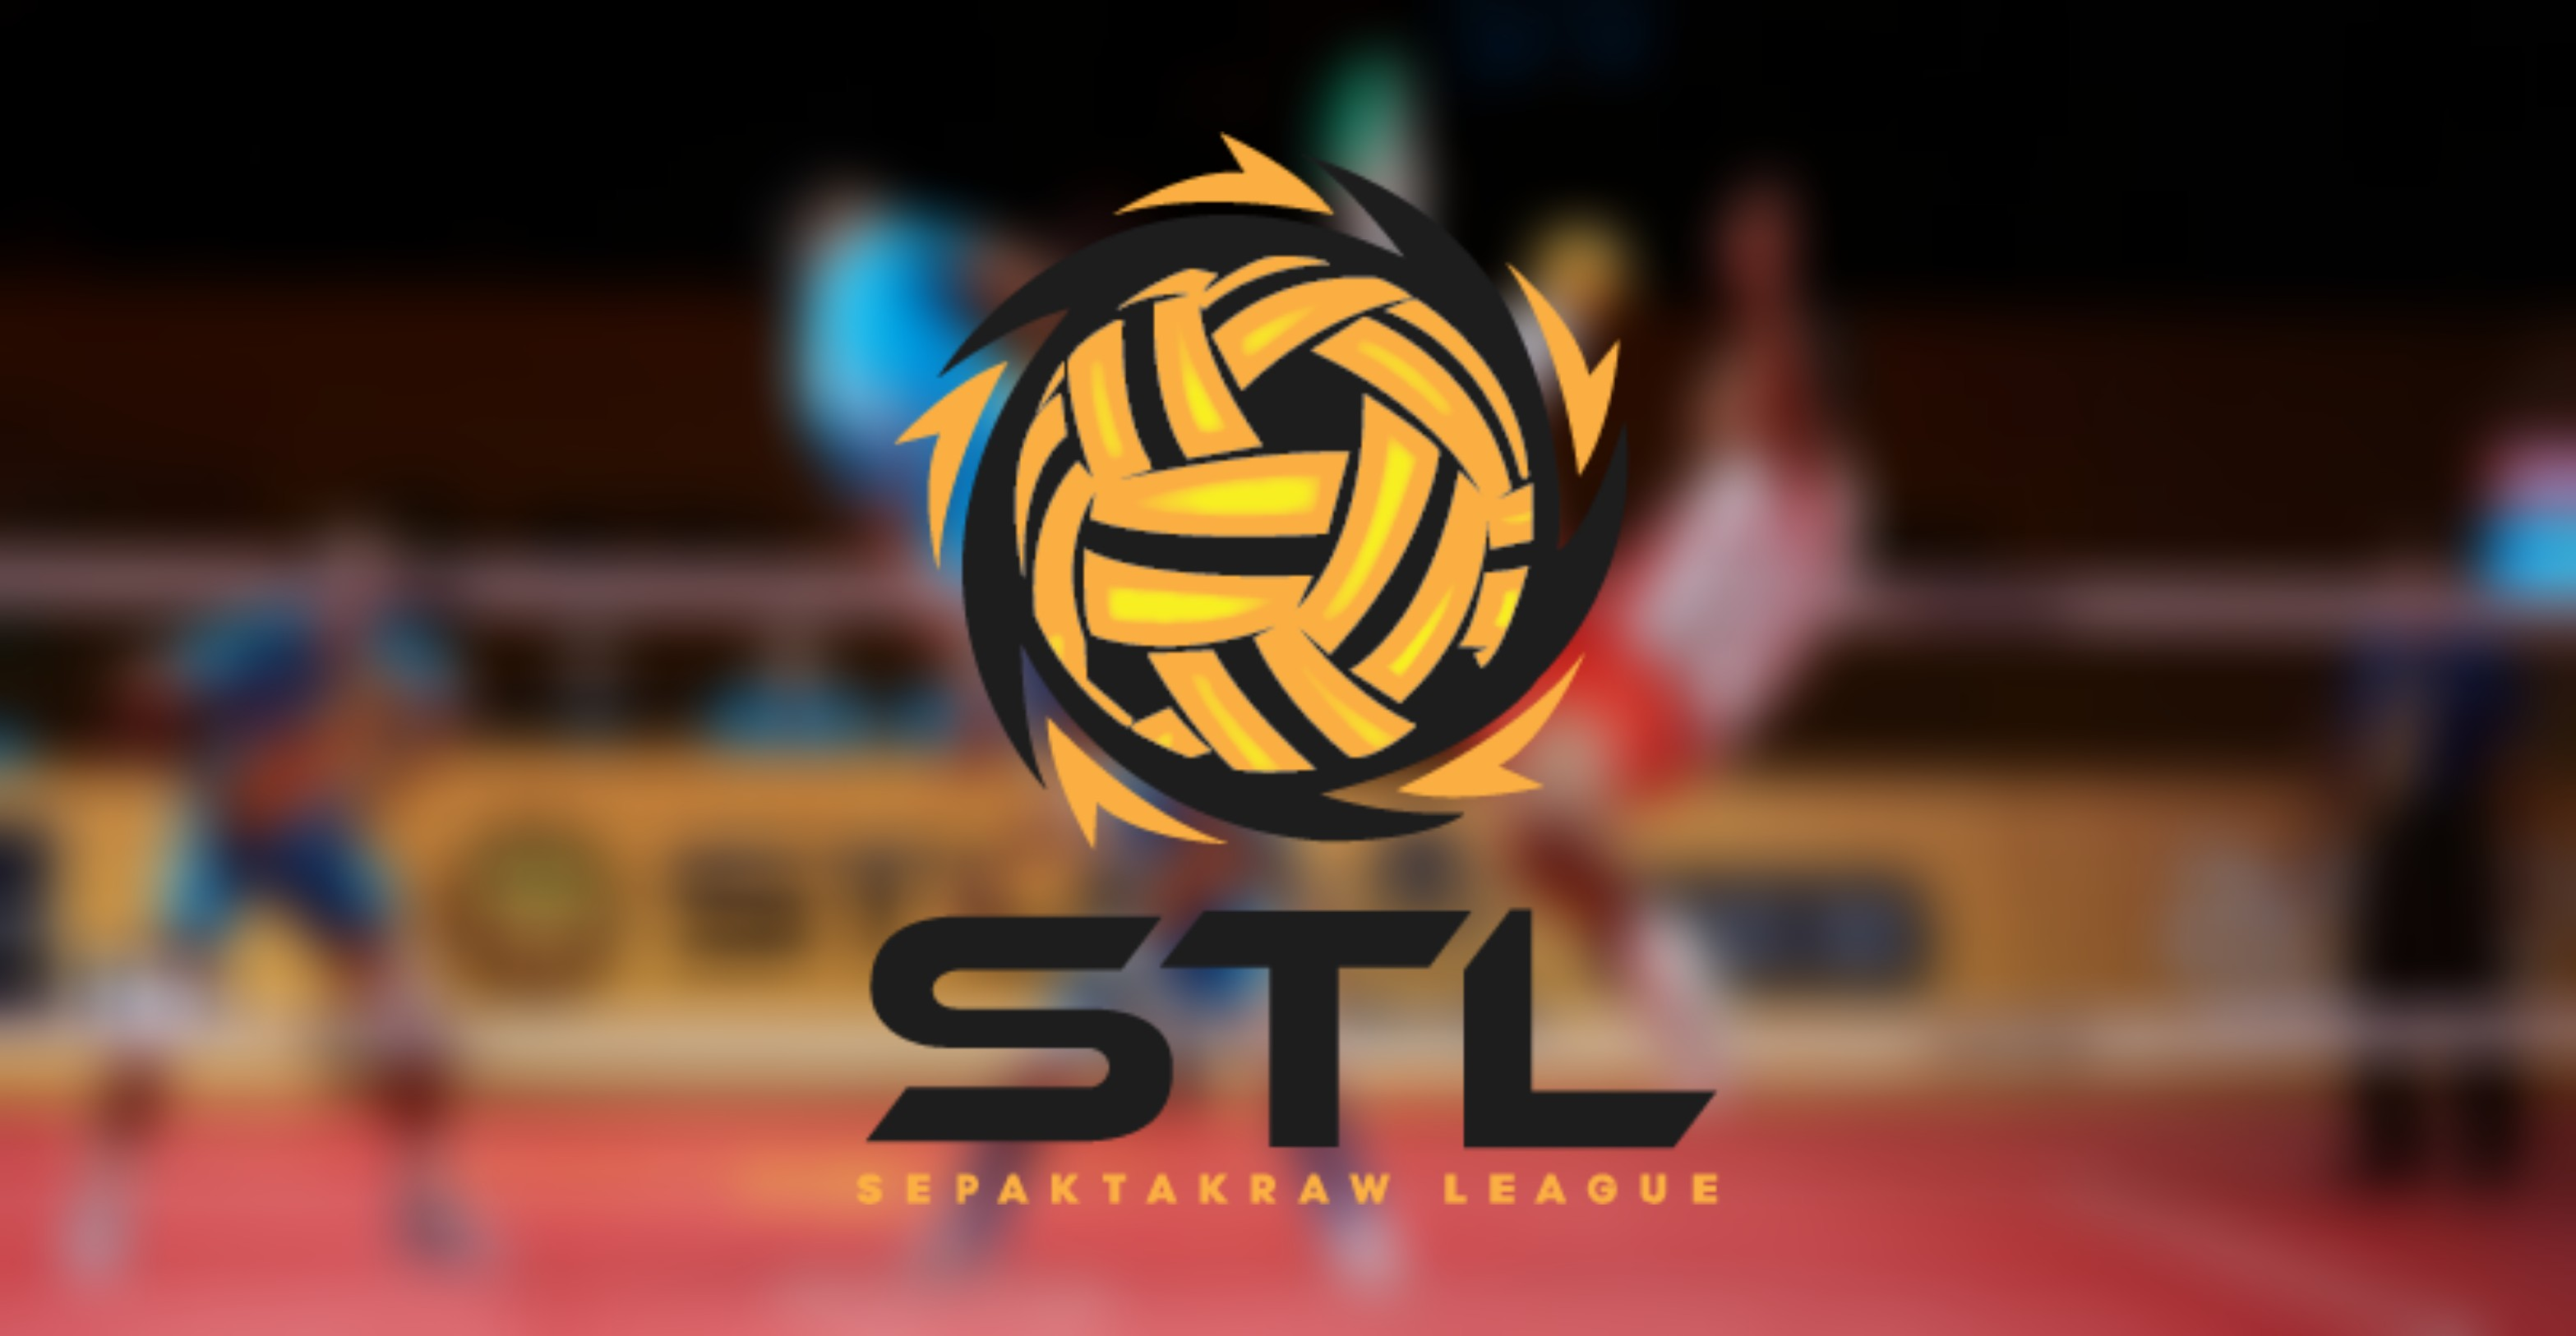 Keputusan STL 2018 Sepak Takraw League